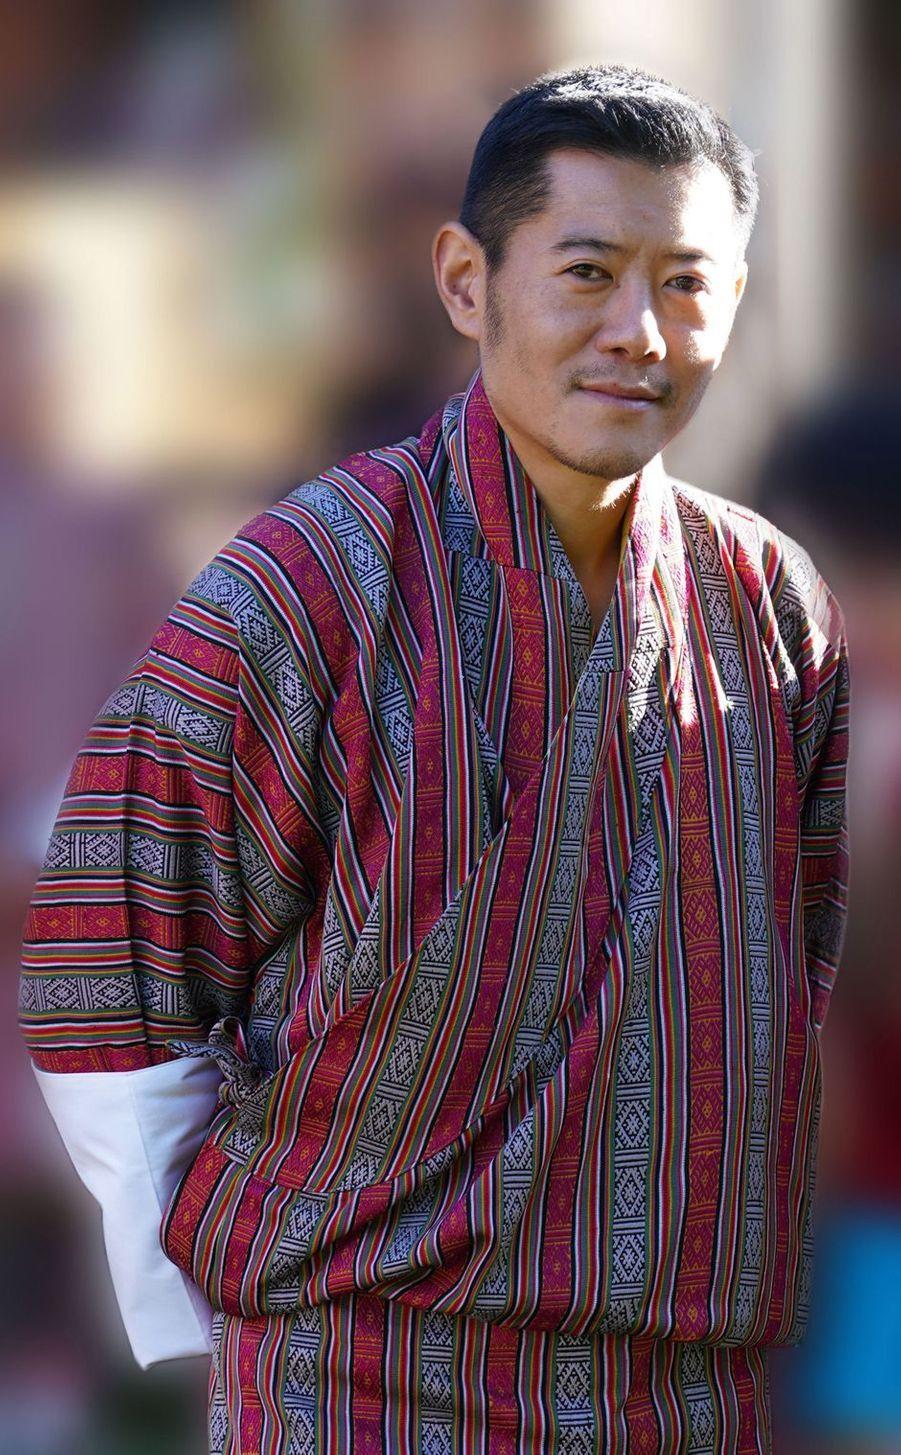 Le roi du Bhoutan Jigme Khesar Namgyel Wangchuck à Timphu. Photo diffusée le 31 octobre 2020